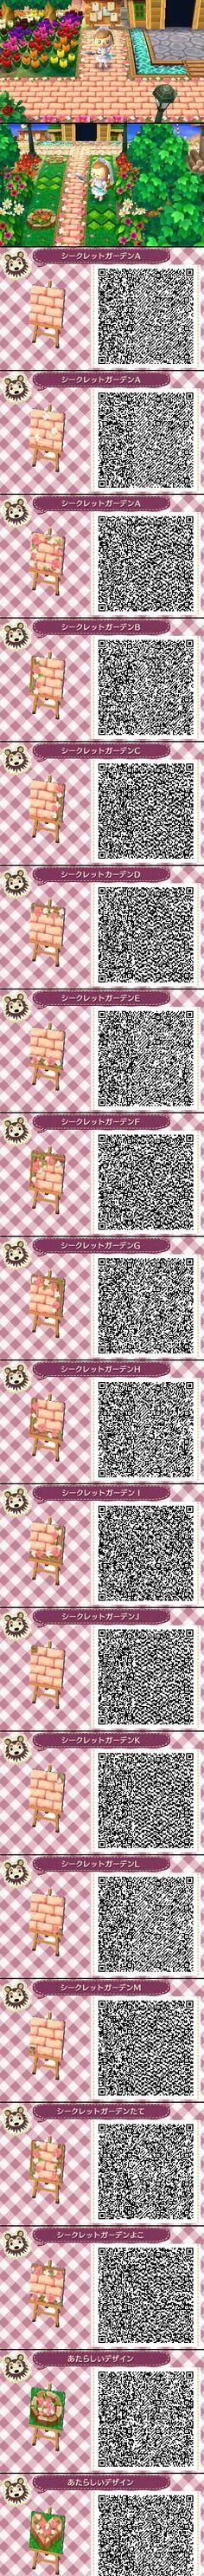 Animal Crossing: New Leaf - pink stone path QR-code